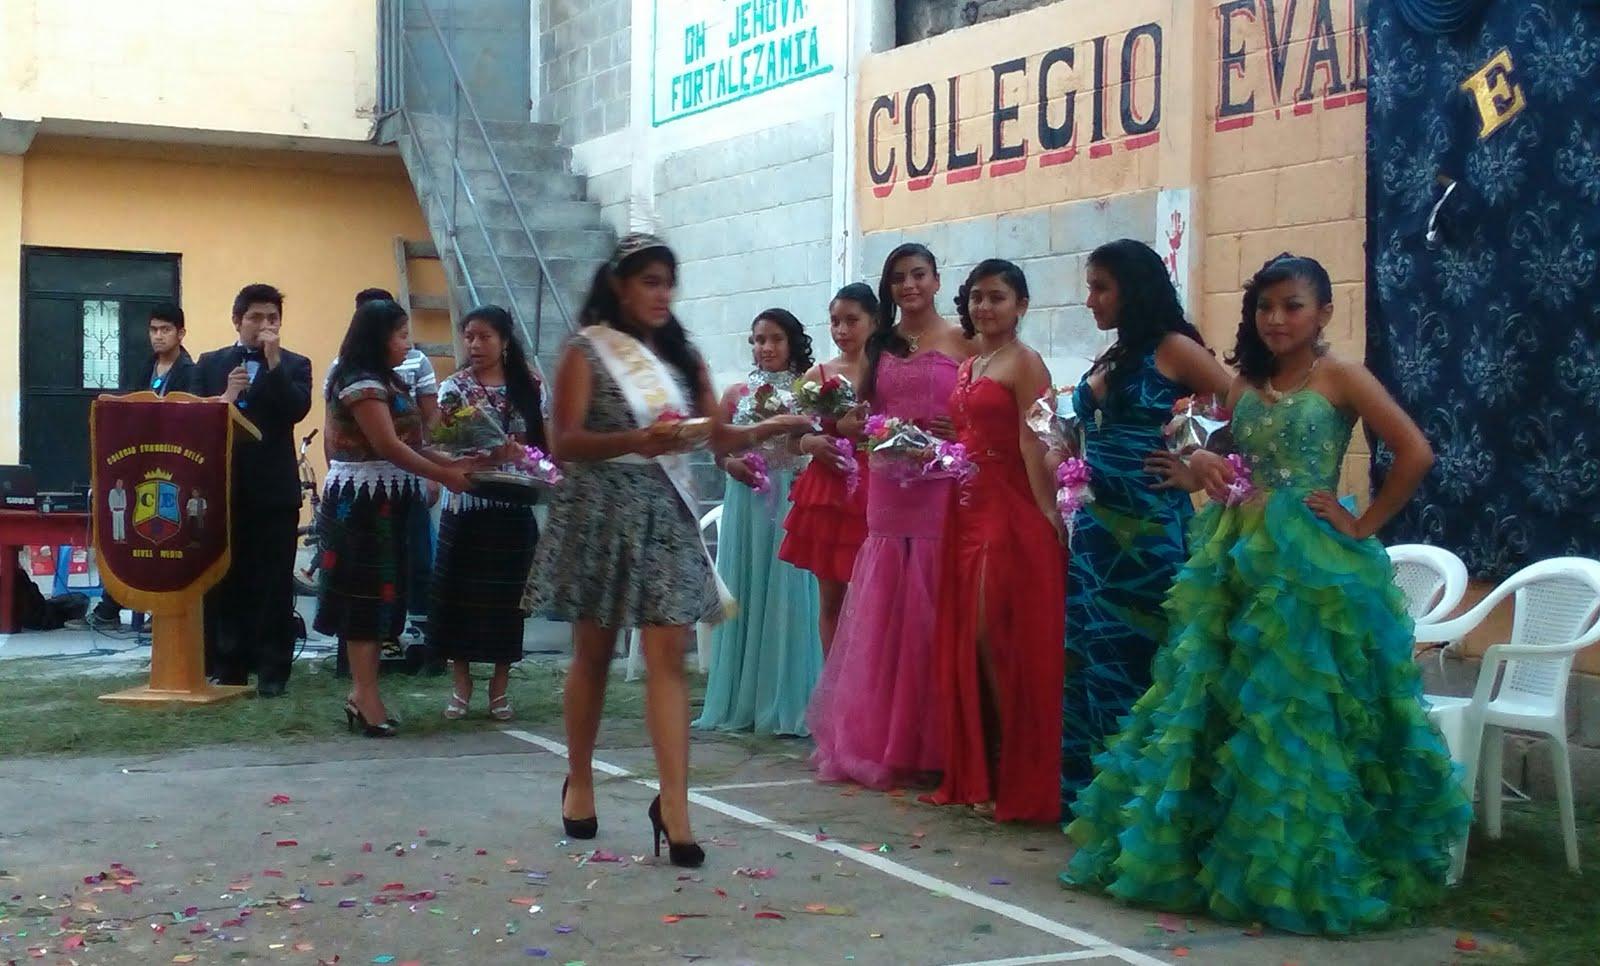 BELLEZA FEMENINA DEL COLEGIO